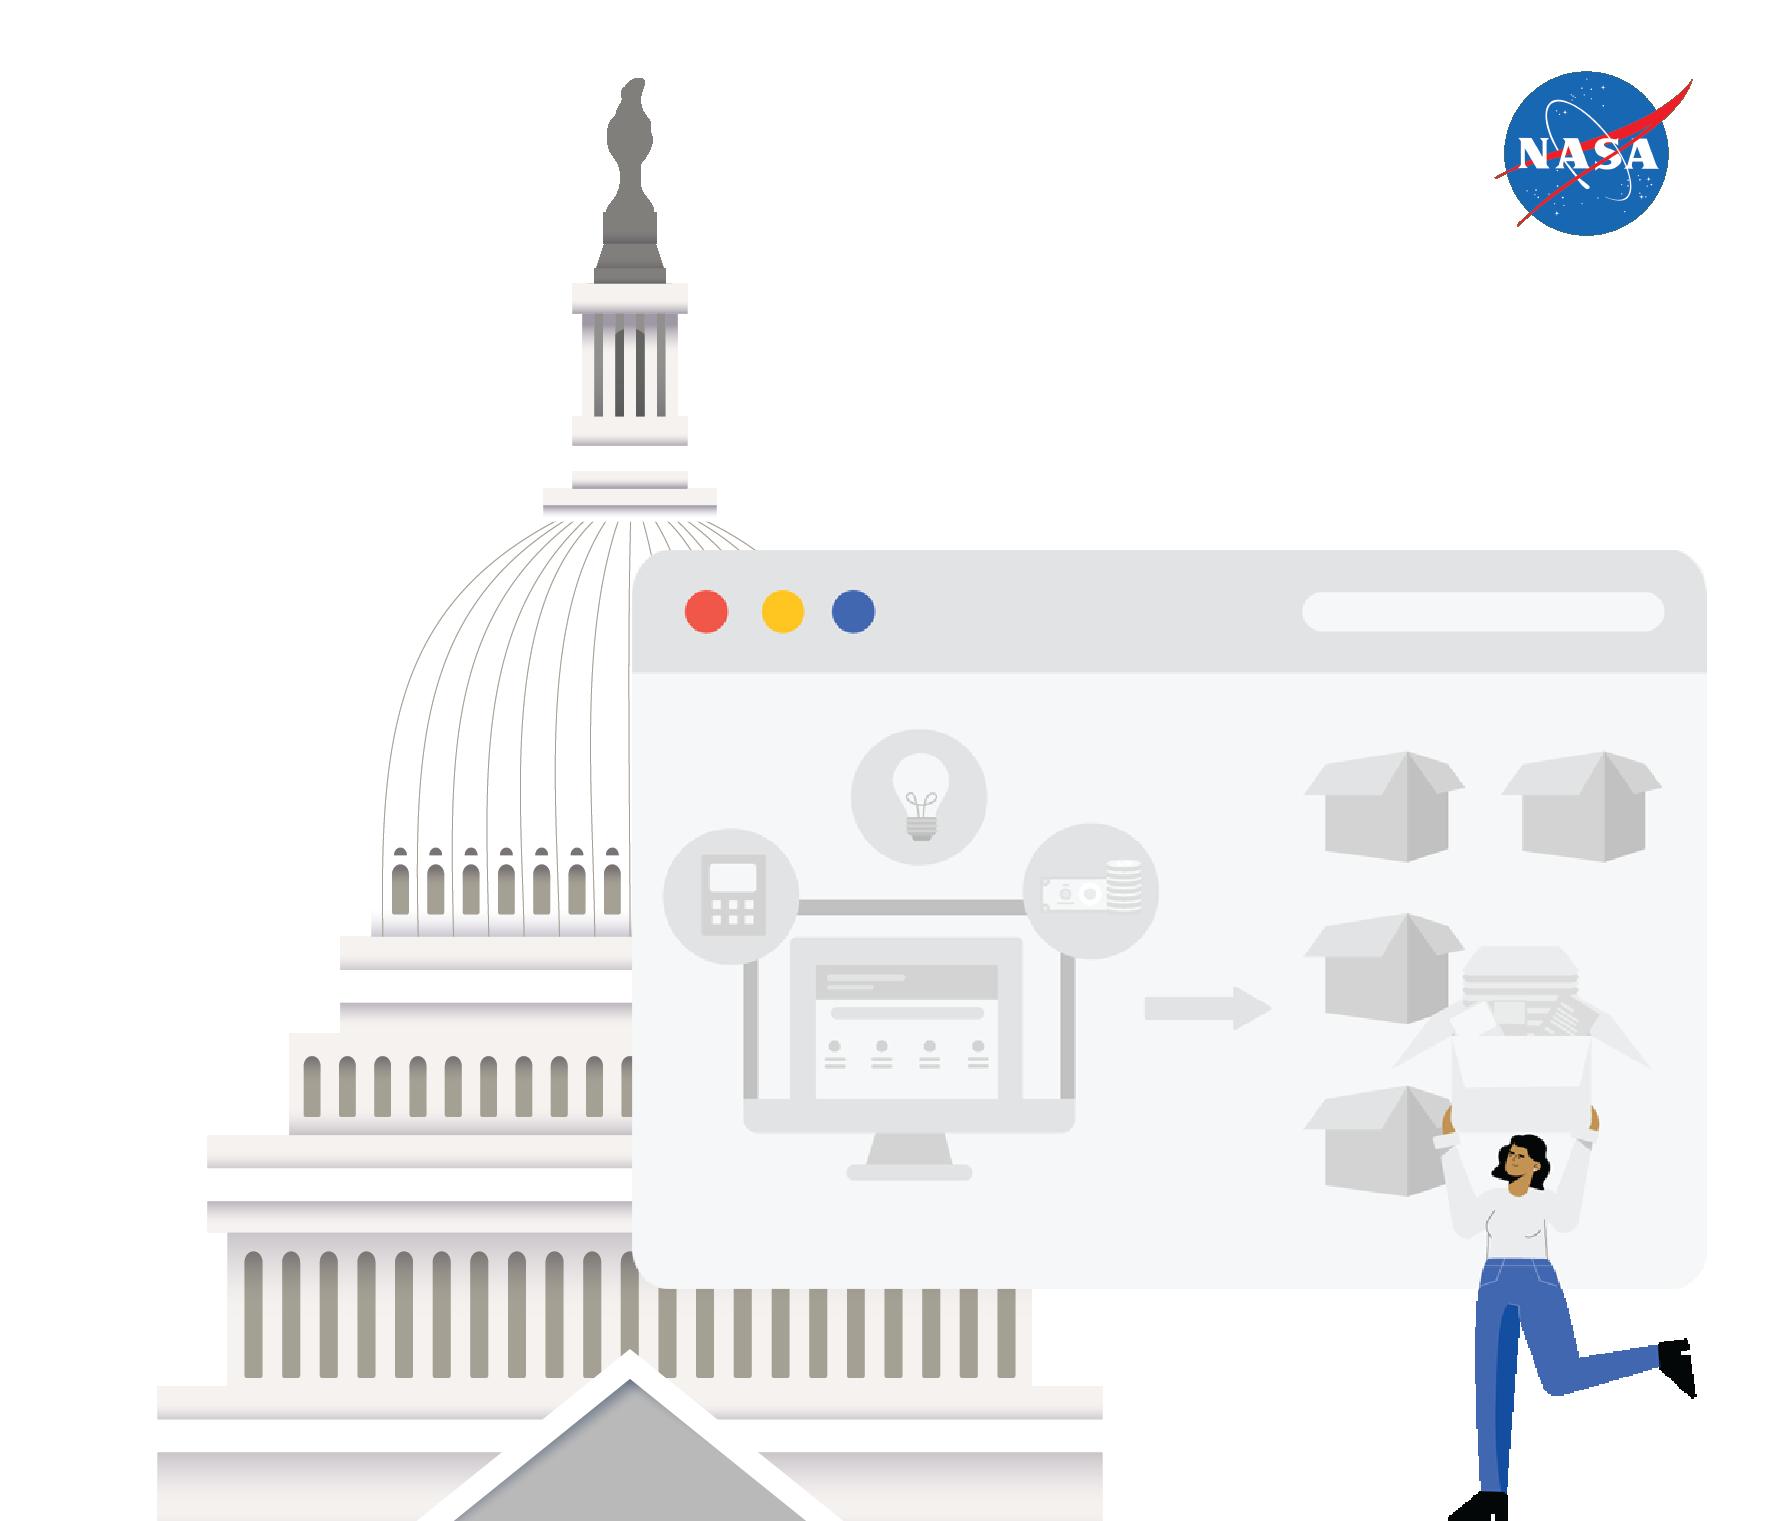 NASA SEWP Federal Contract Awards